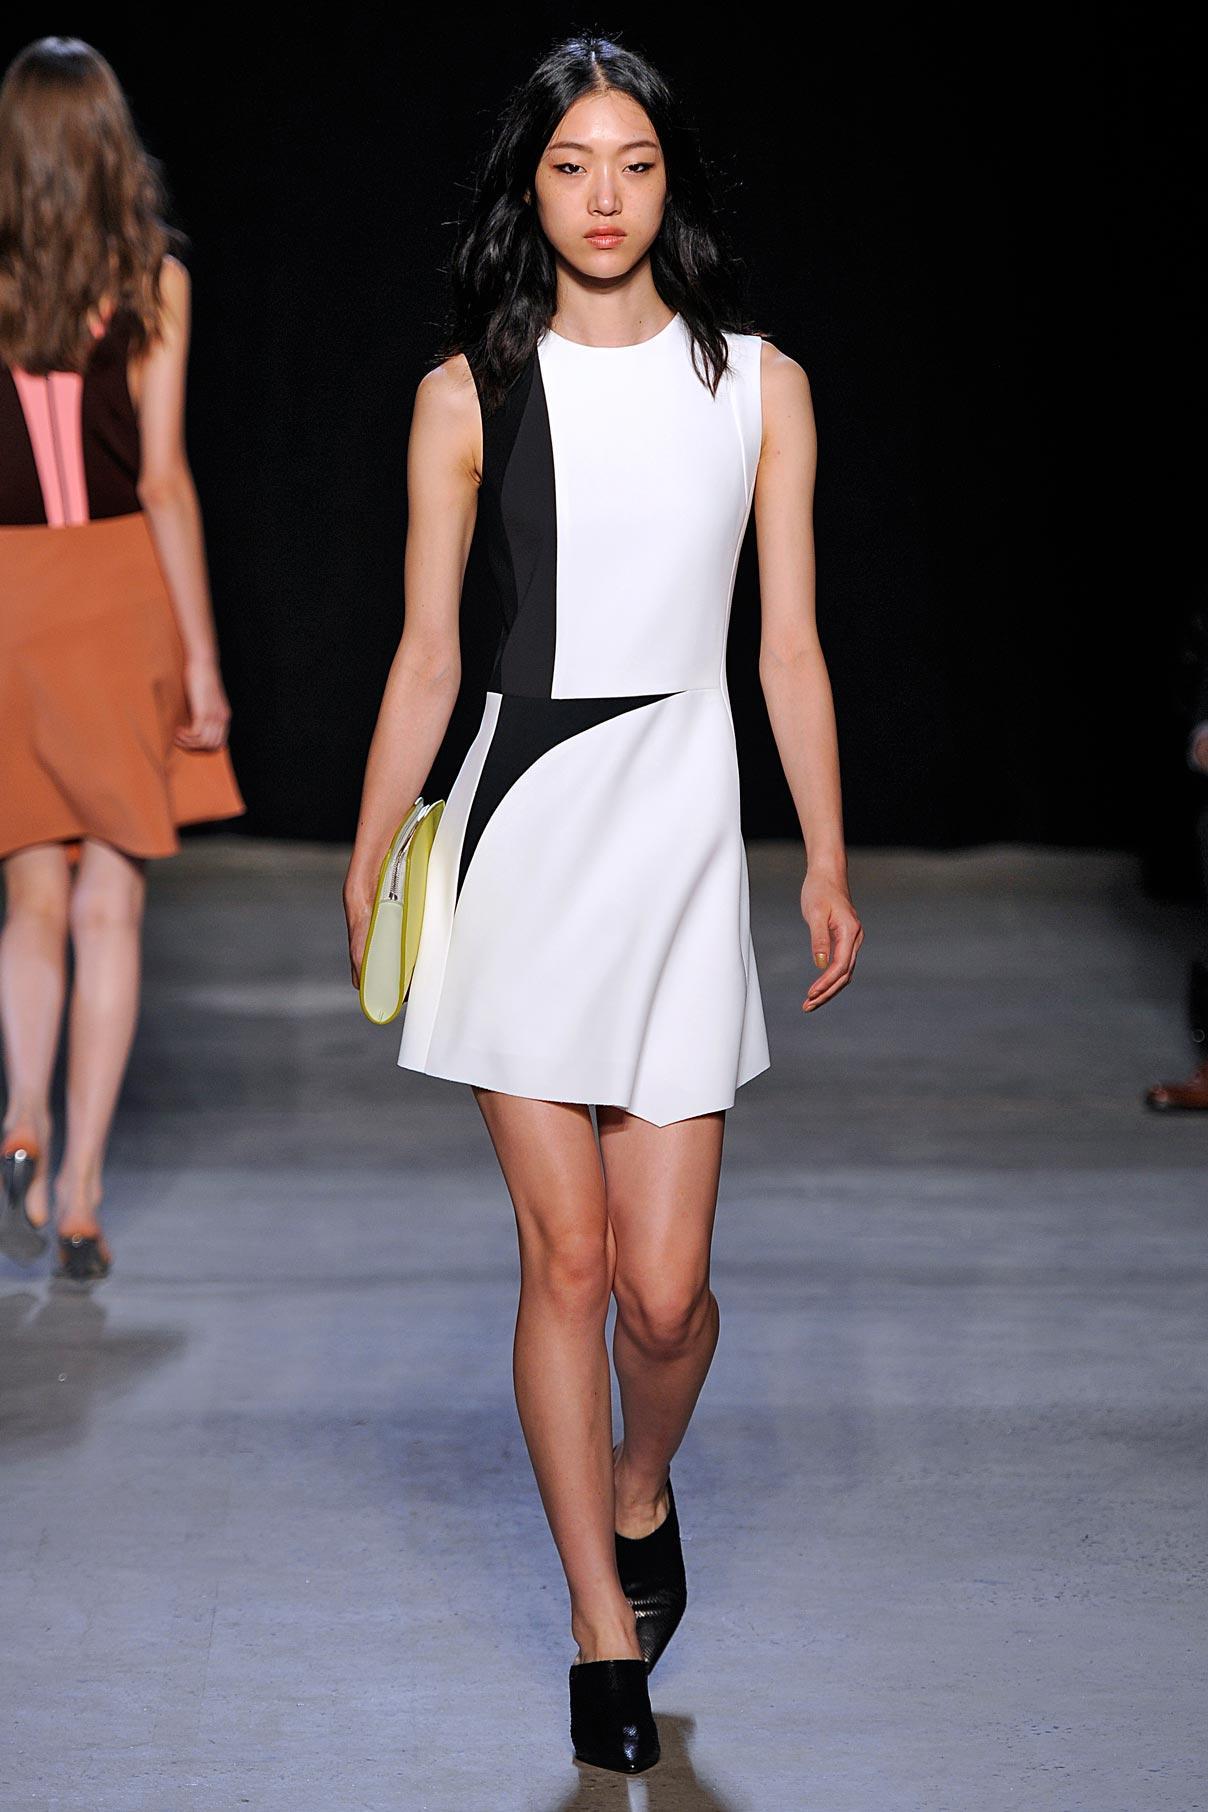 Look 8 White/green/lava/black geometric dress.